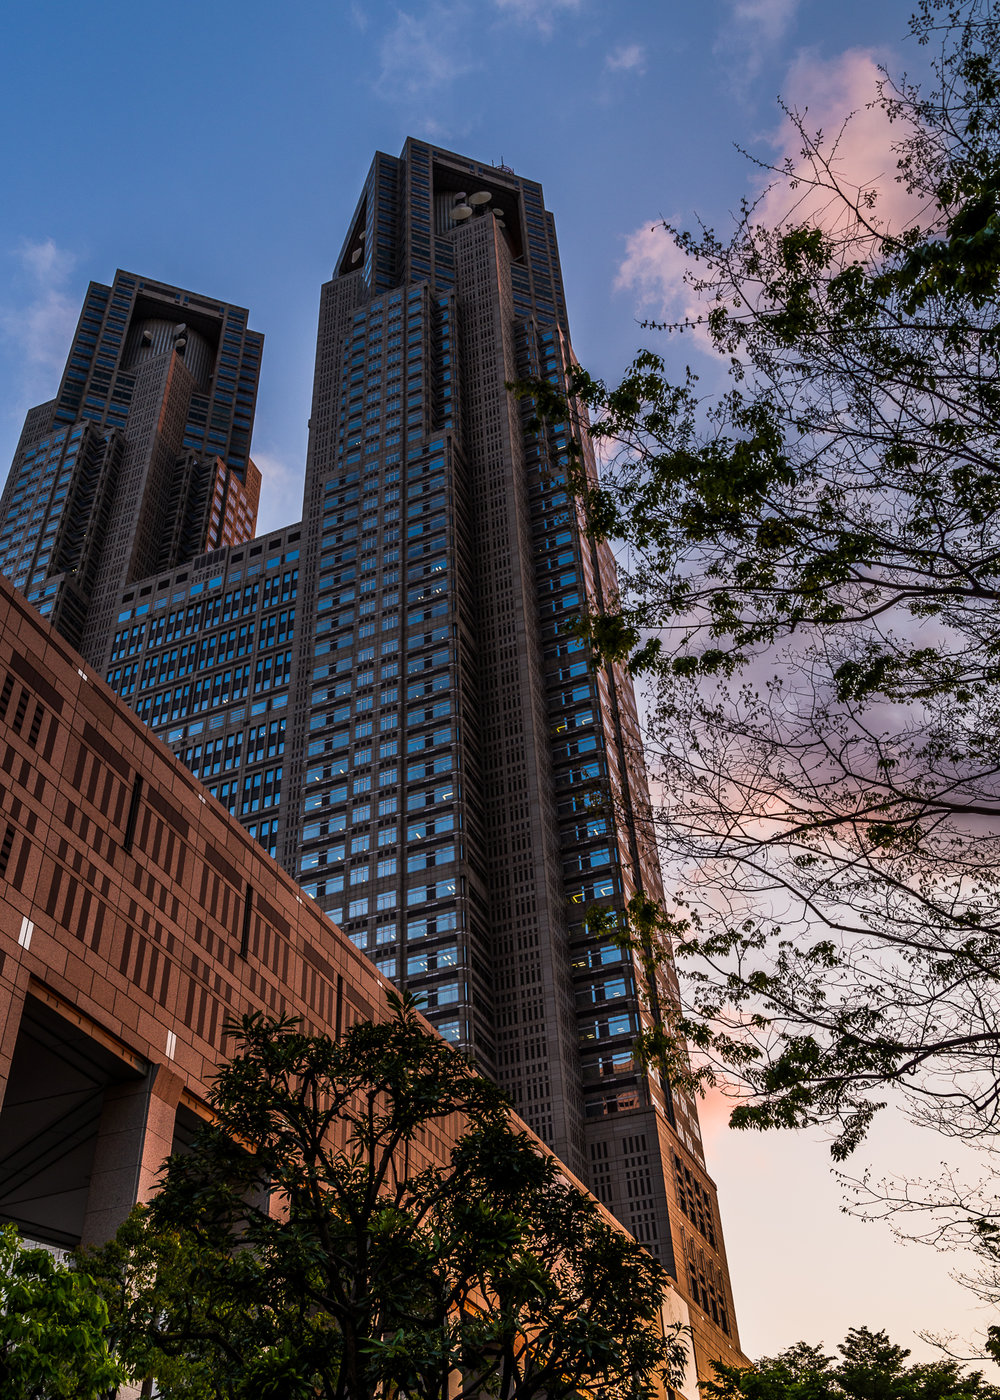 Tokyo Metropolitan Governmental building